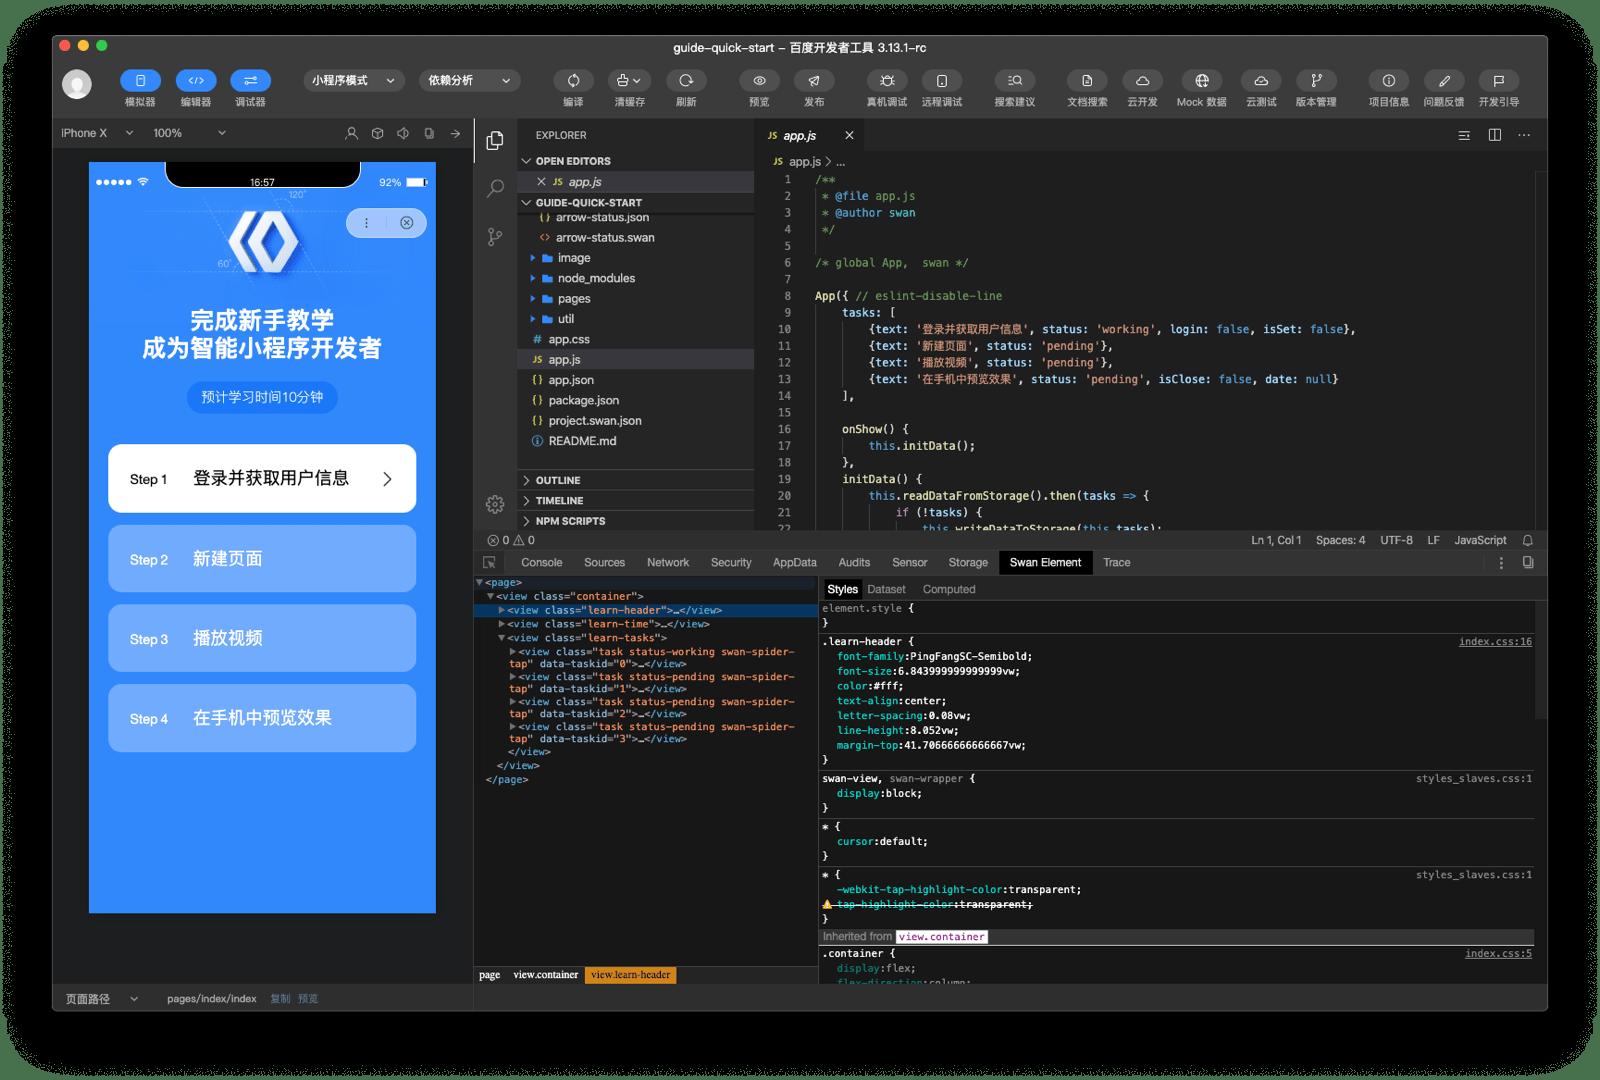 Baidu DevTools application window showing simulator, code editor, and debugger.